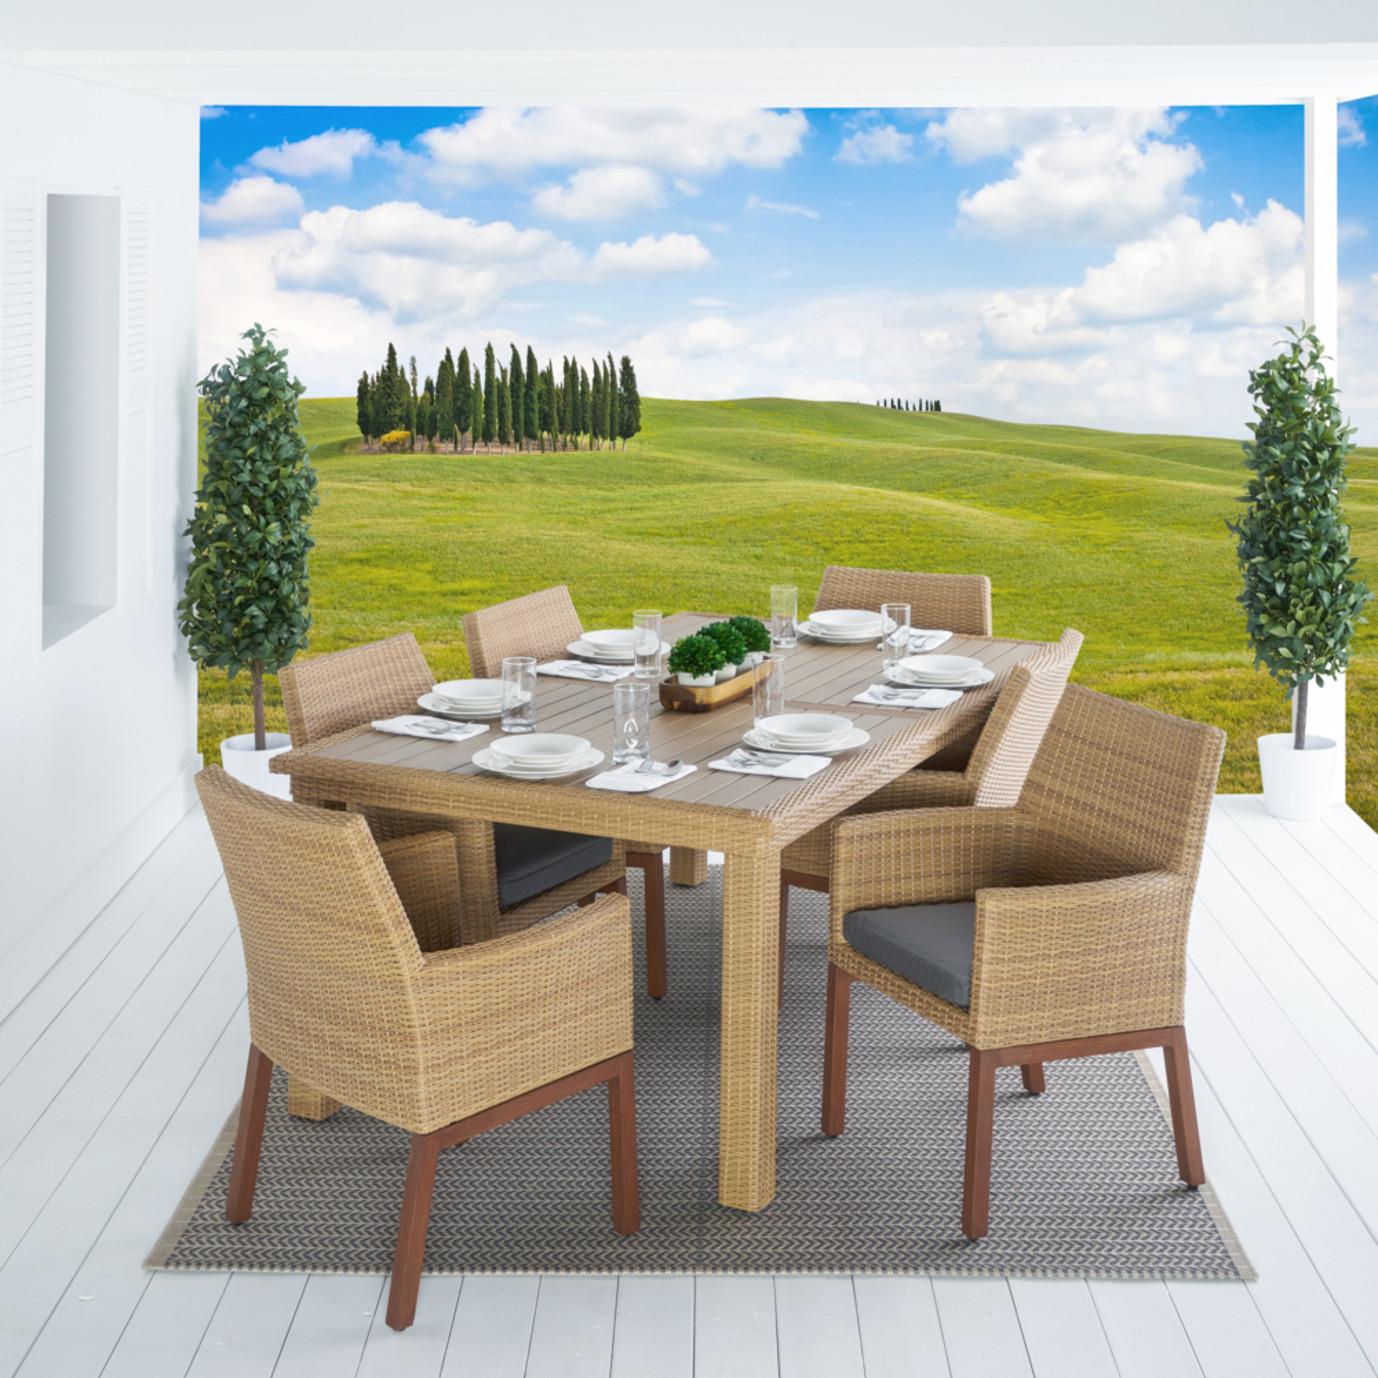 Mili™ 7pc Dining Set - Charcoal Gray